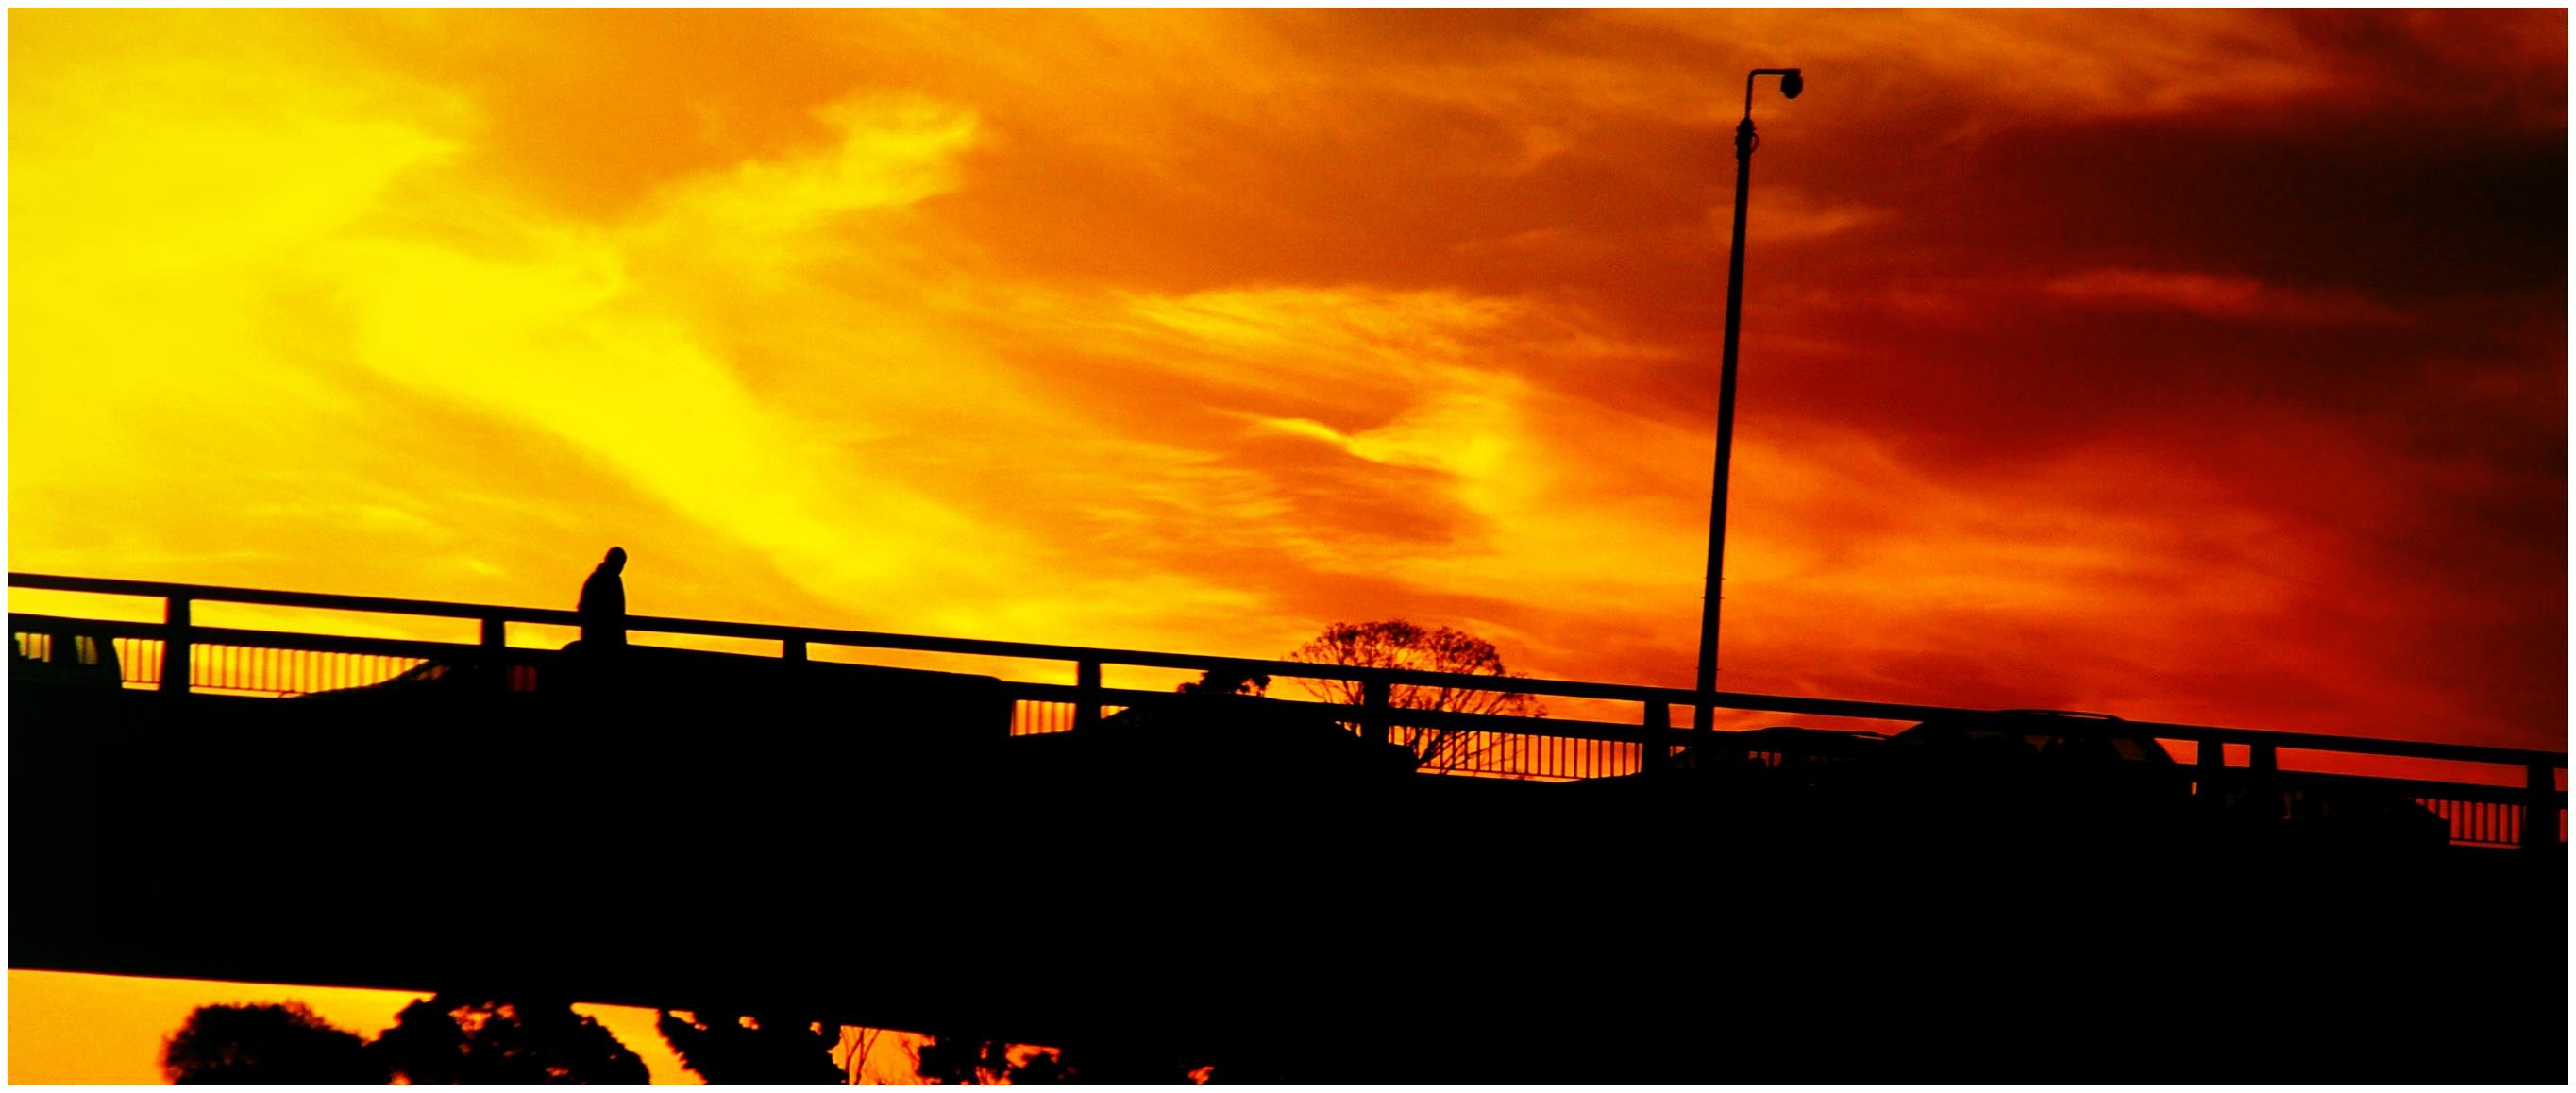 Overpass, sunset